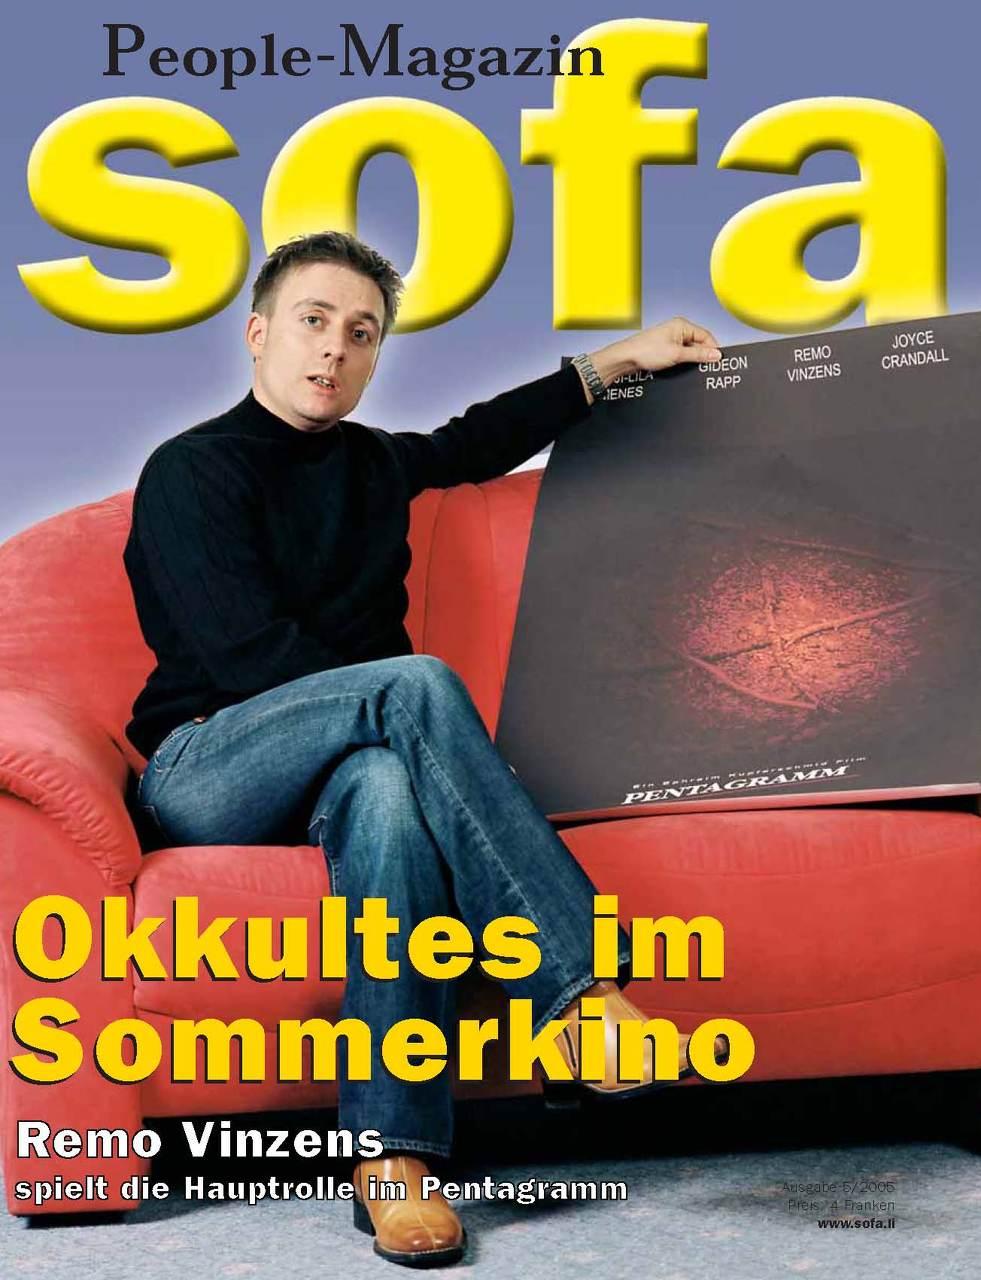 Remo Vinzens on Sofa People Magazin